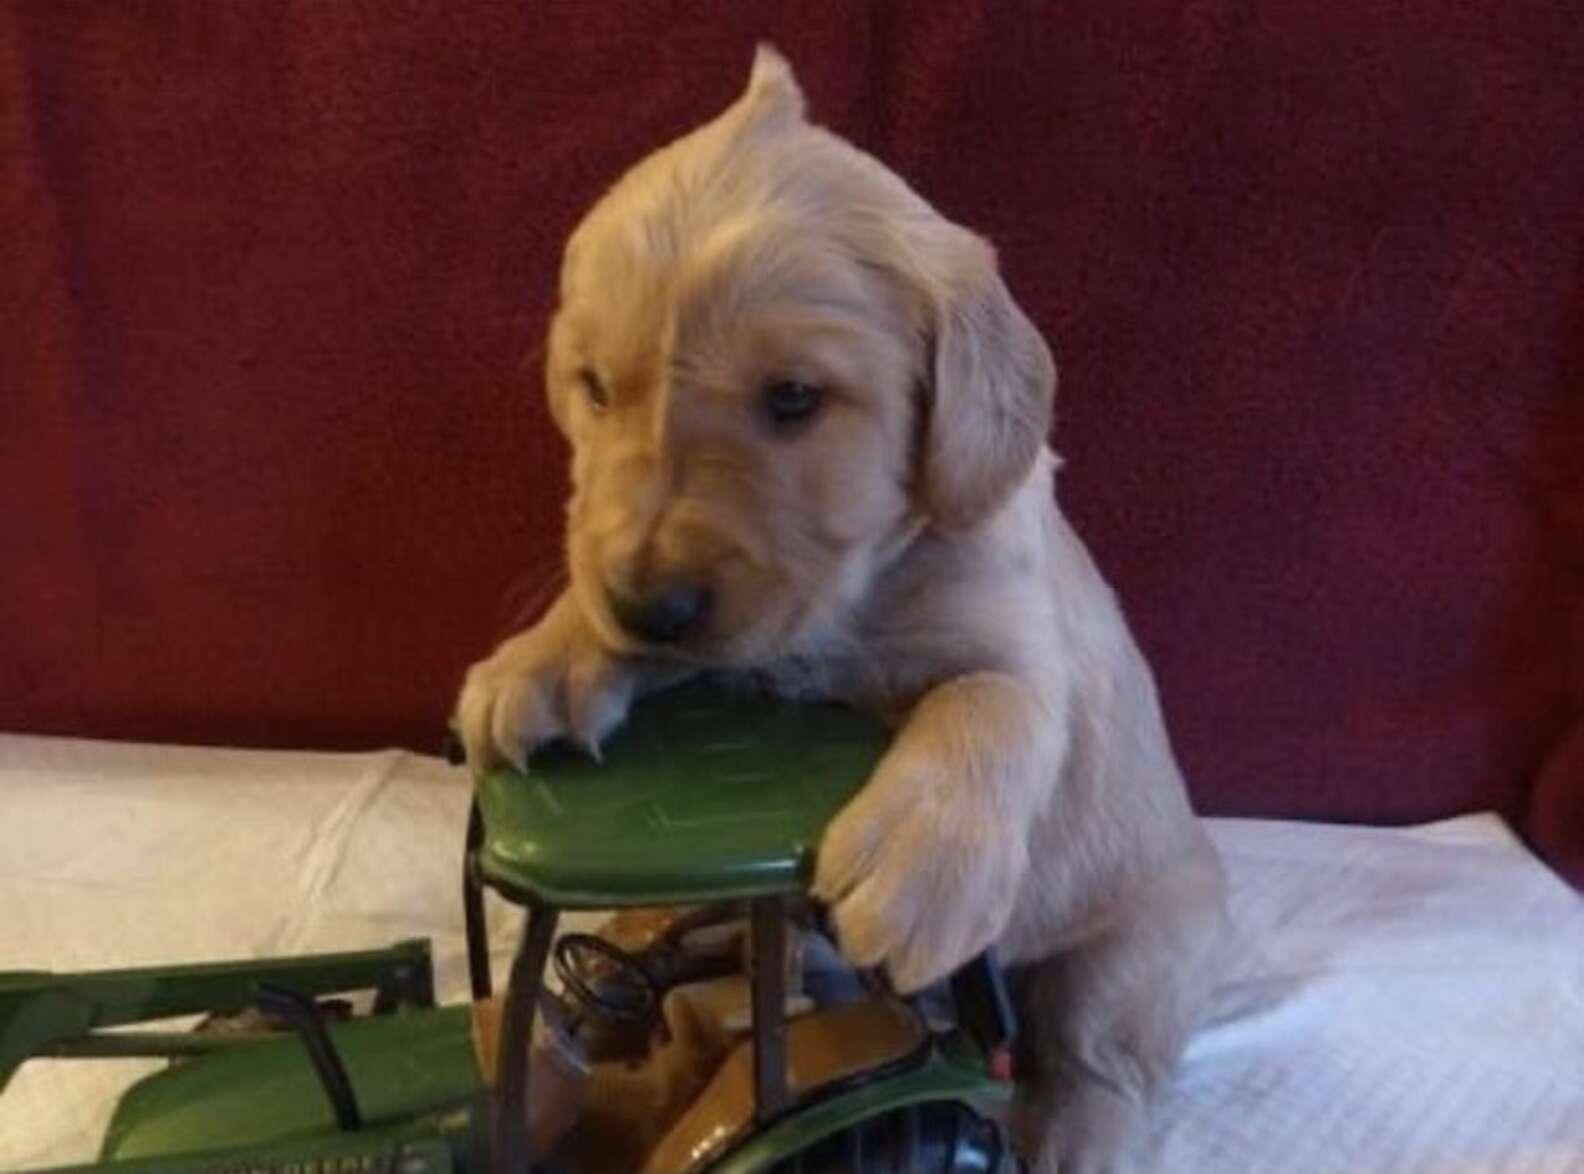 Puppy's Adorable Cowlick